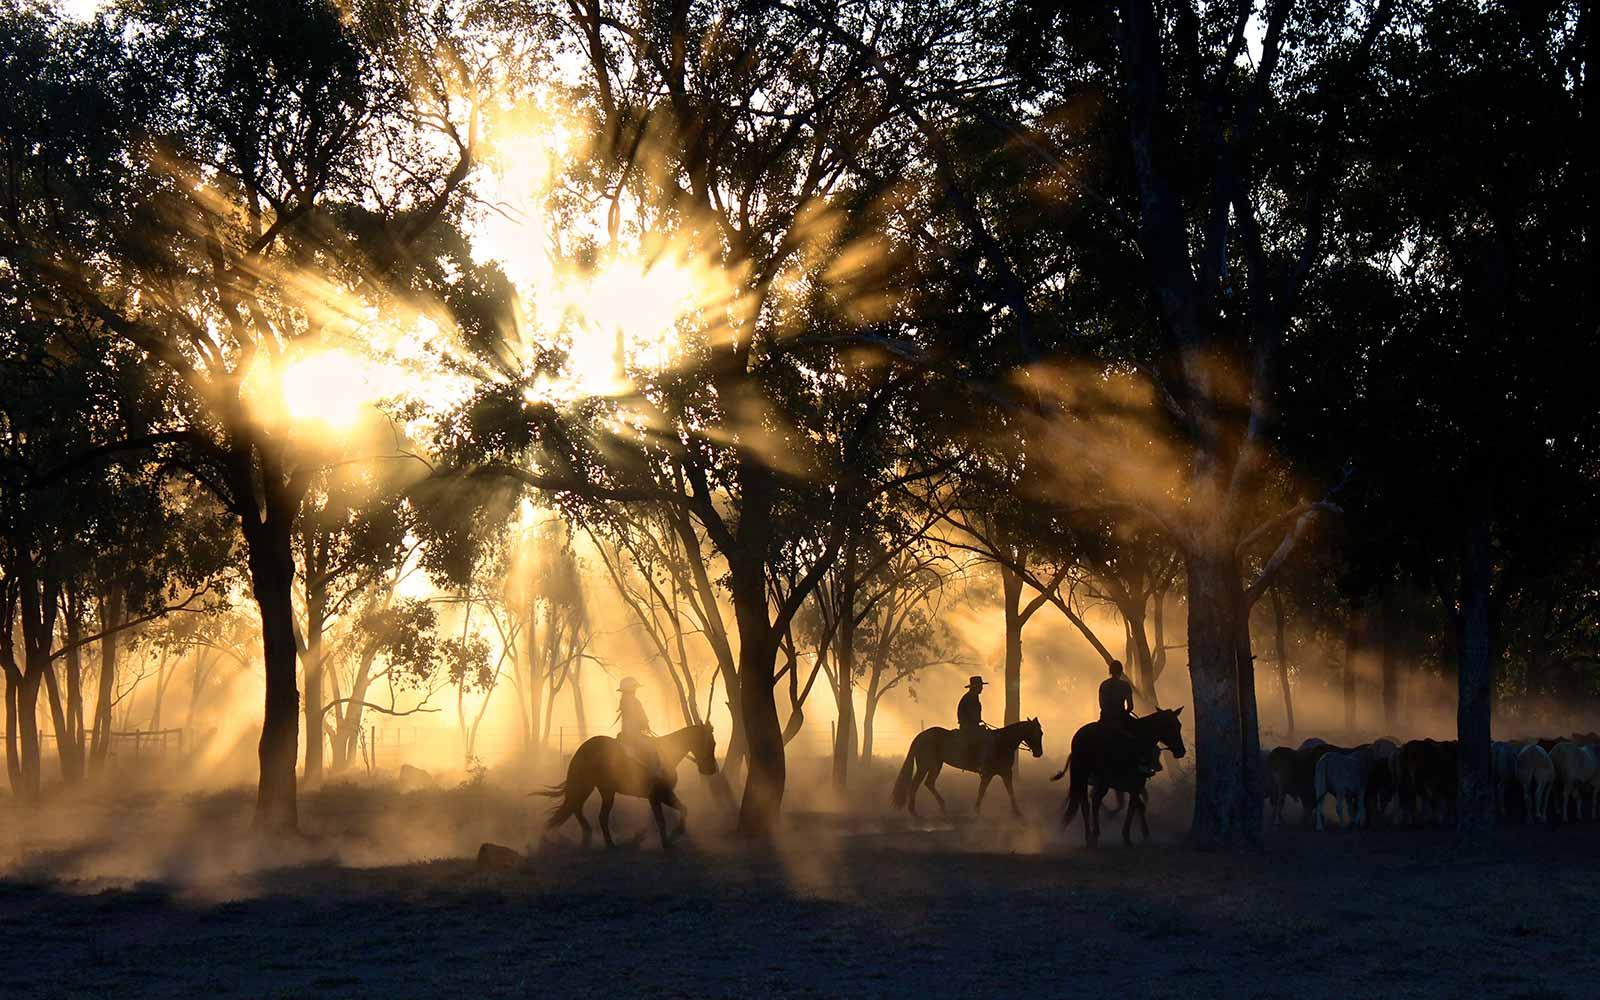 Have an adventure. People on Horseback by photographer Tobias Keller